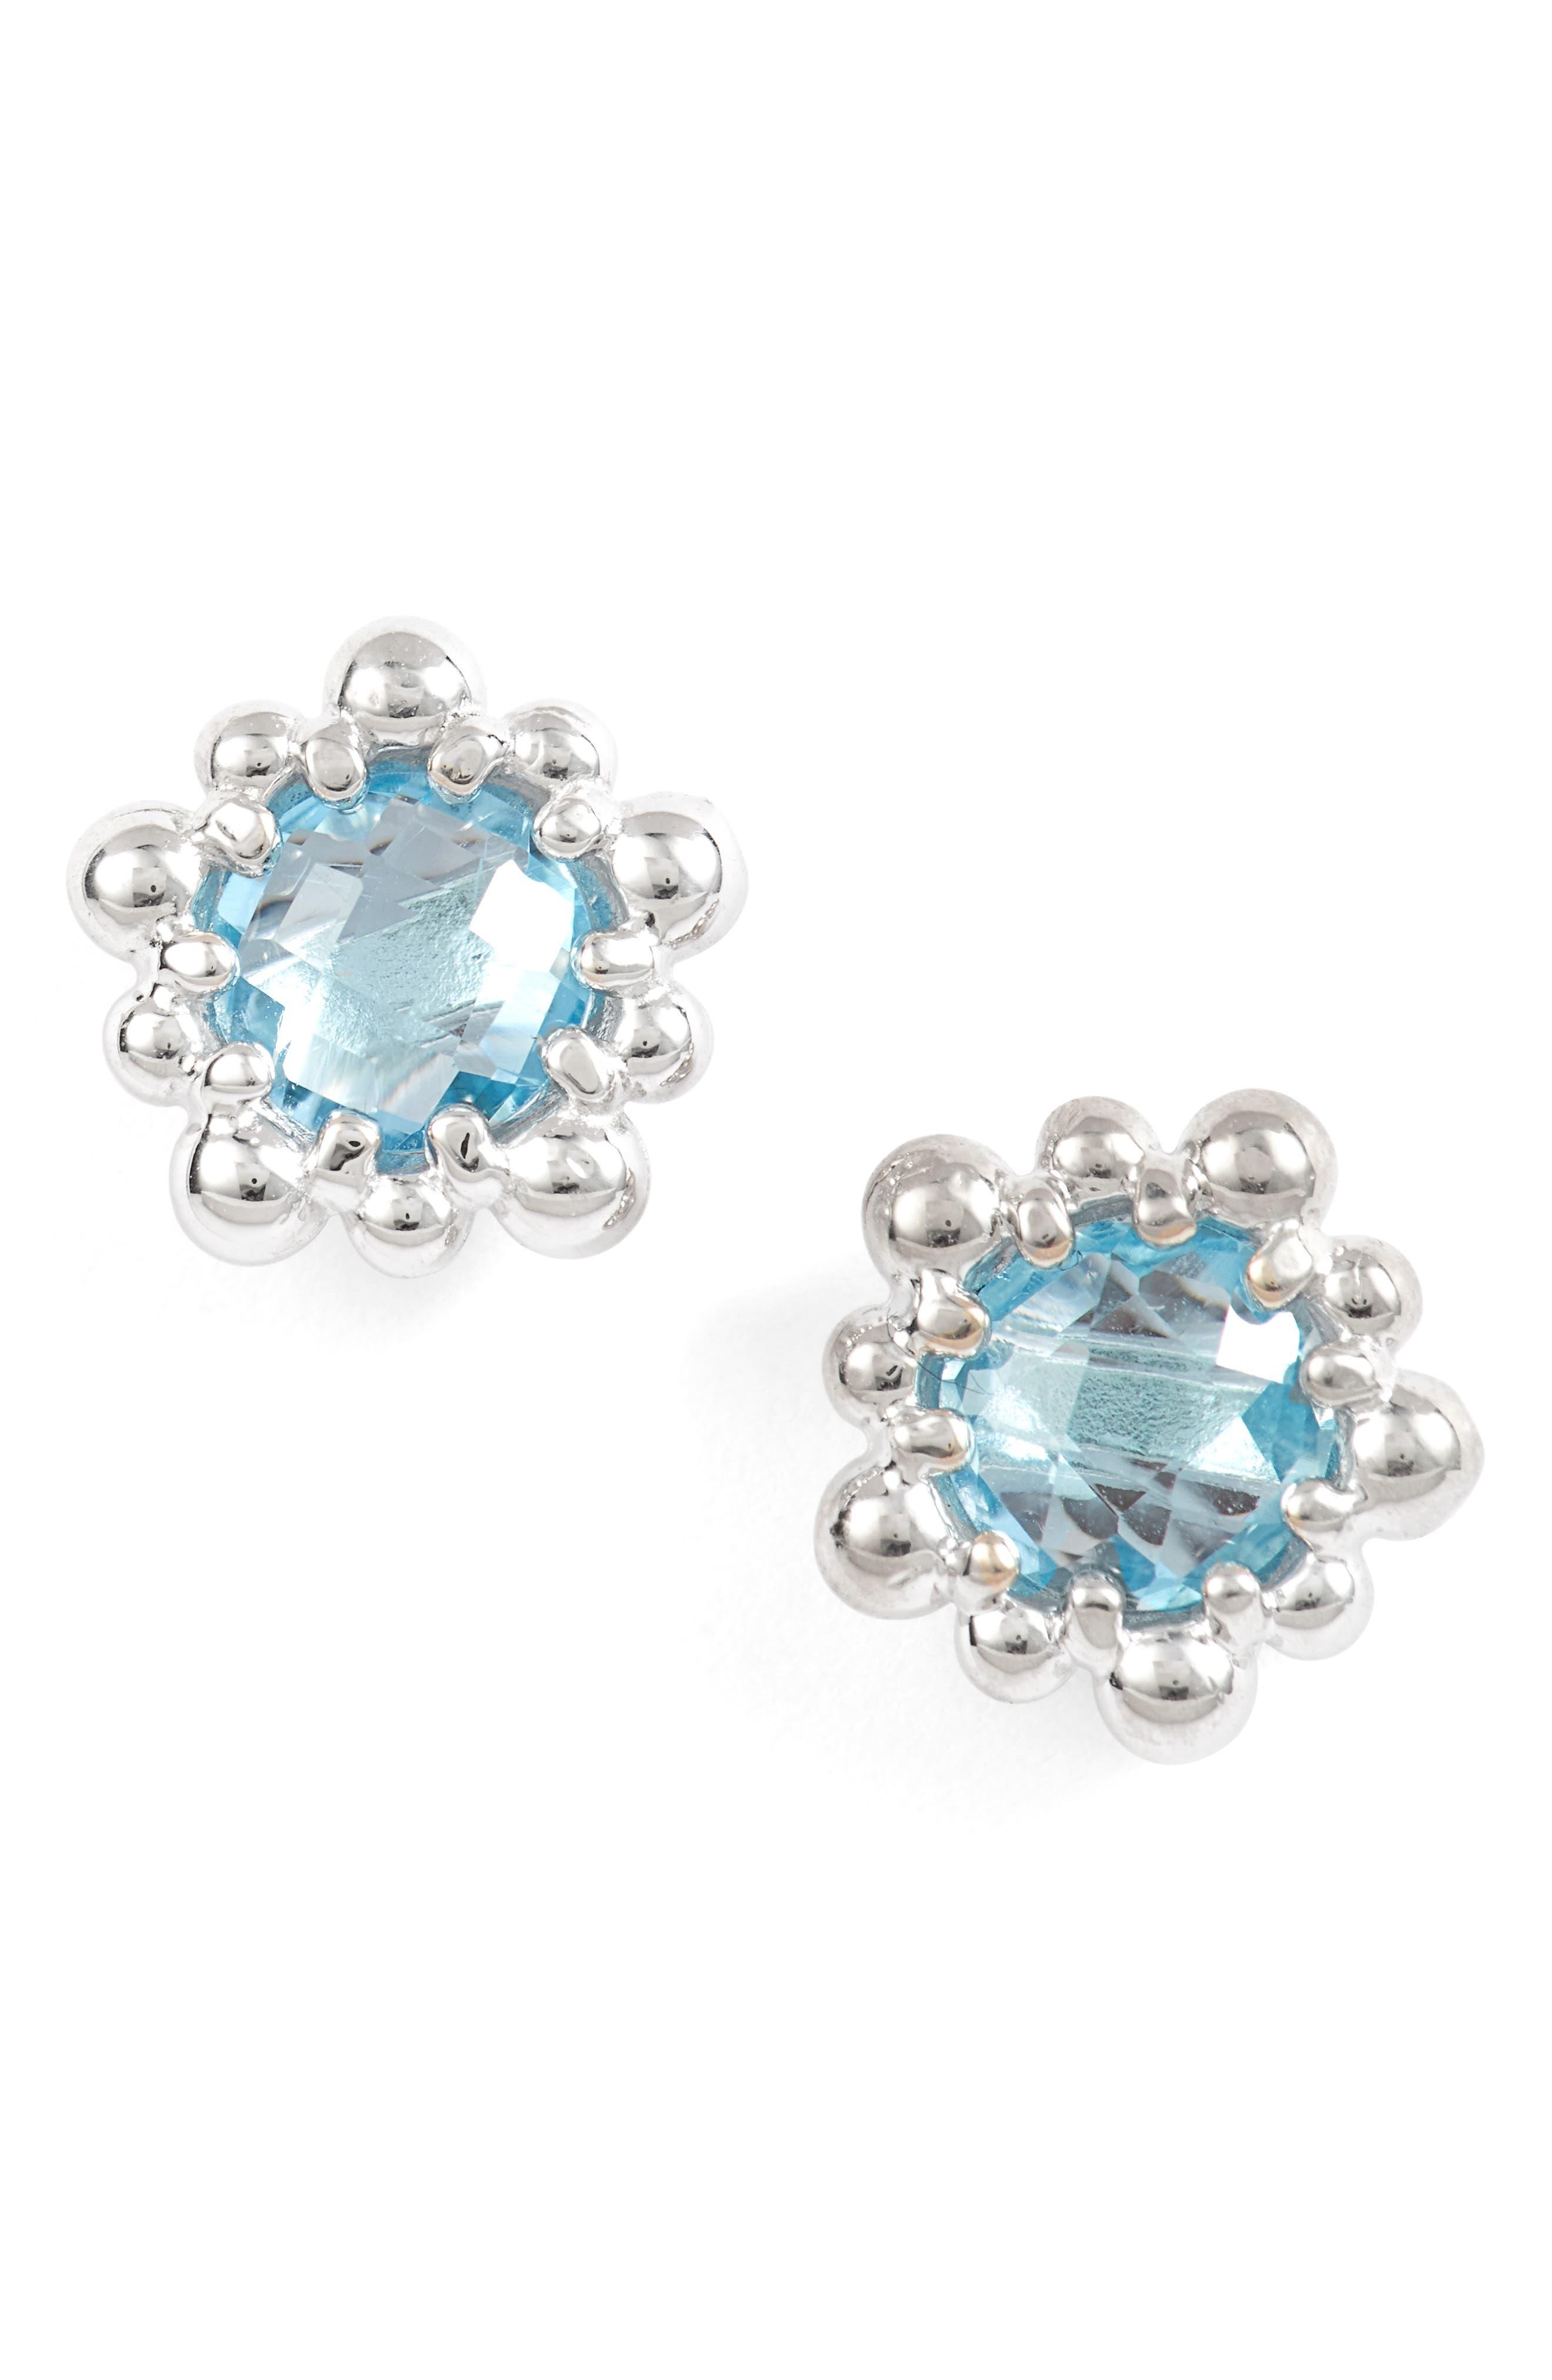 Micro Dew Drop Topaz Earrings,                             Main thumbnail 1, color,                             040